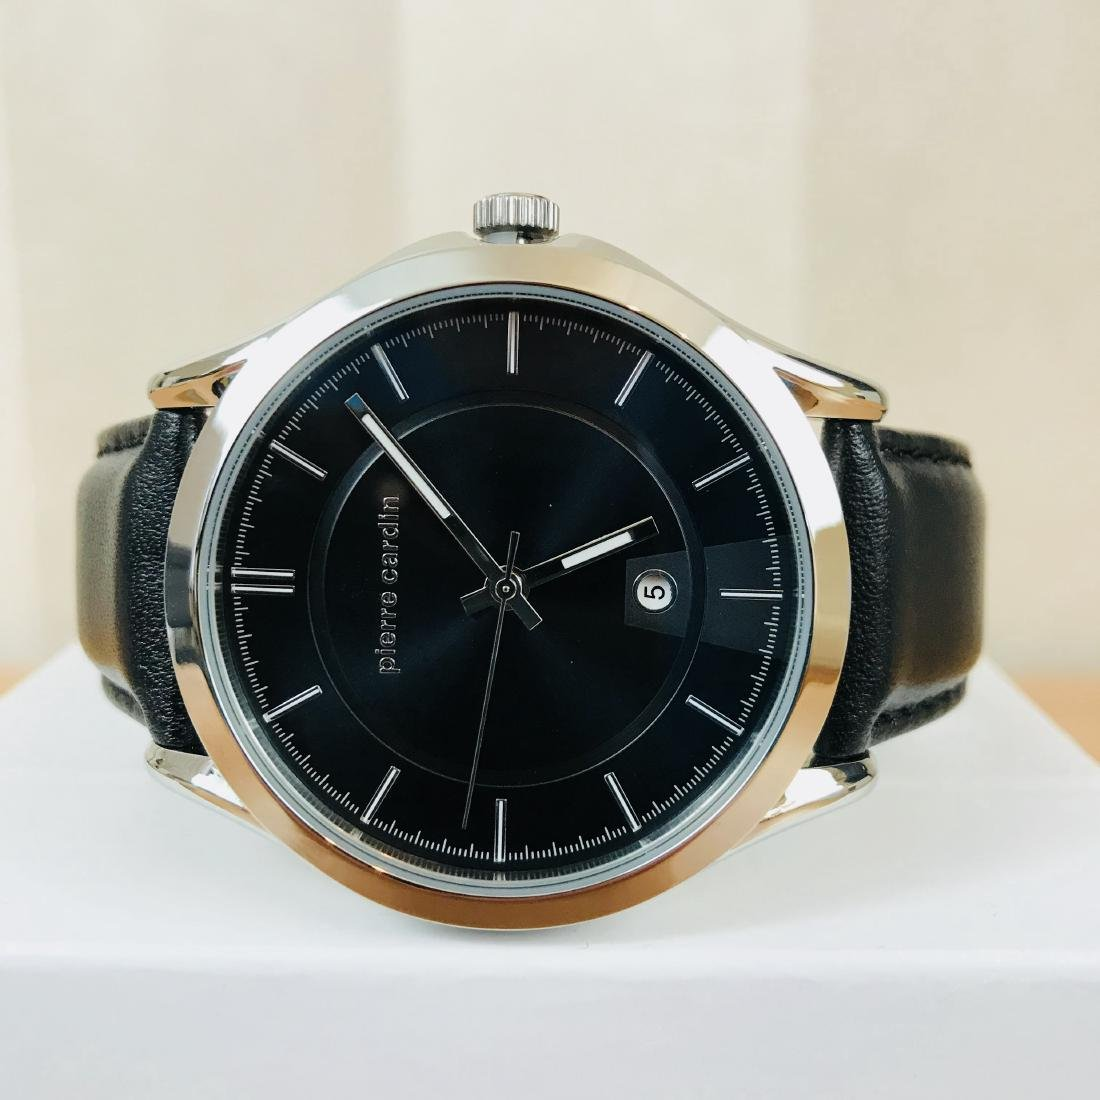 Pierre Cardin – Men's Classic Quartz Watch